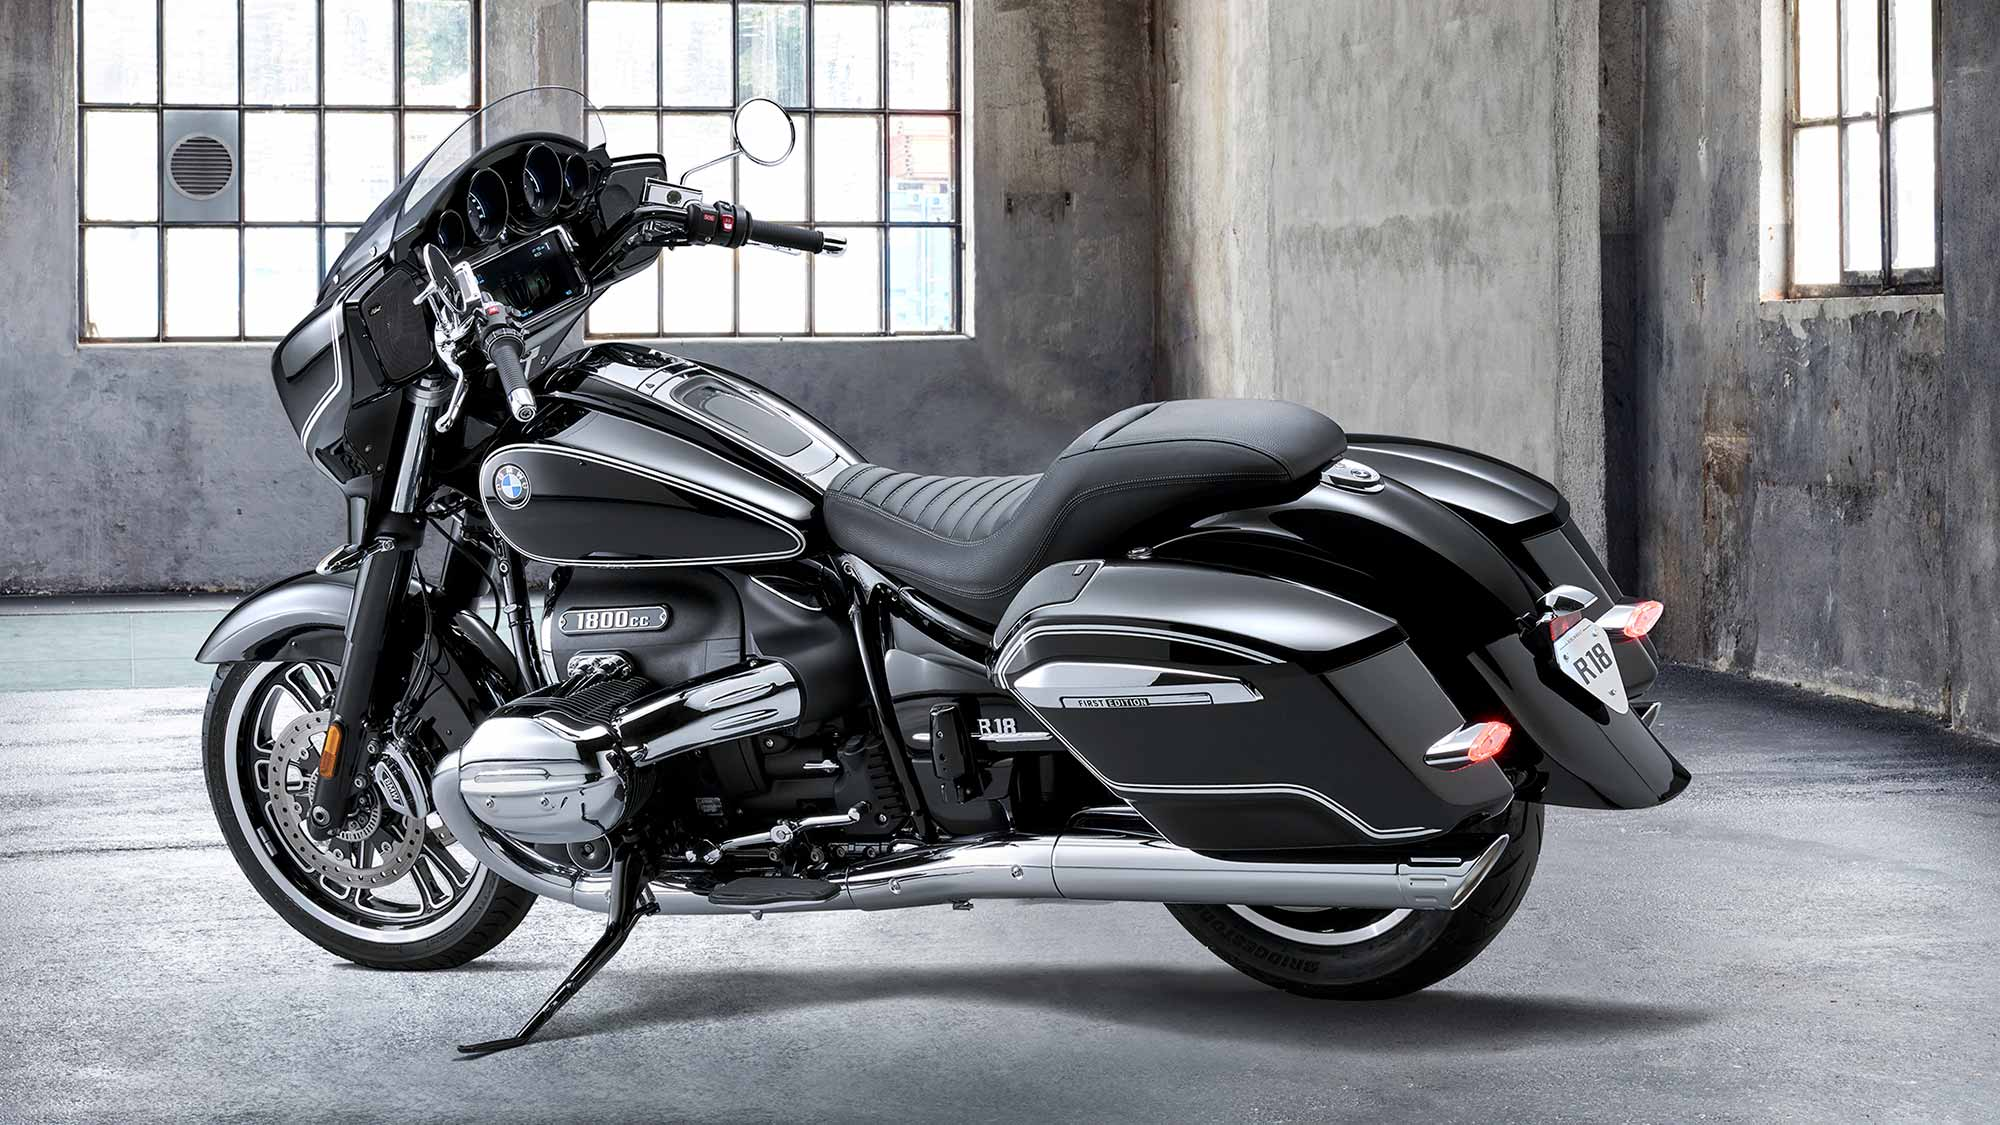 2022 BMW R 18 B Bagger Motorcycle